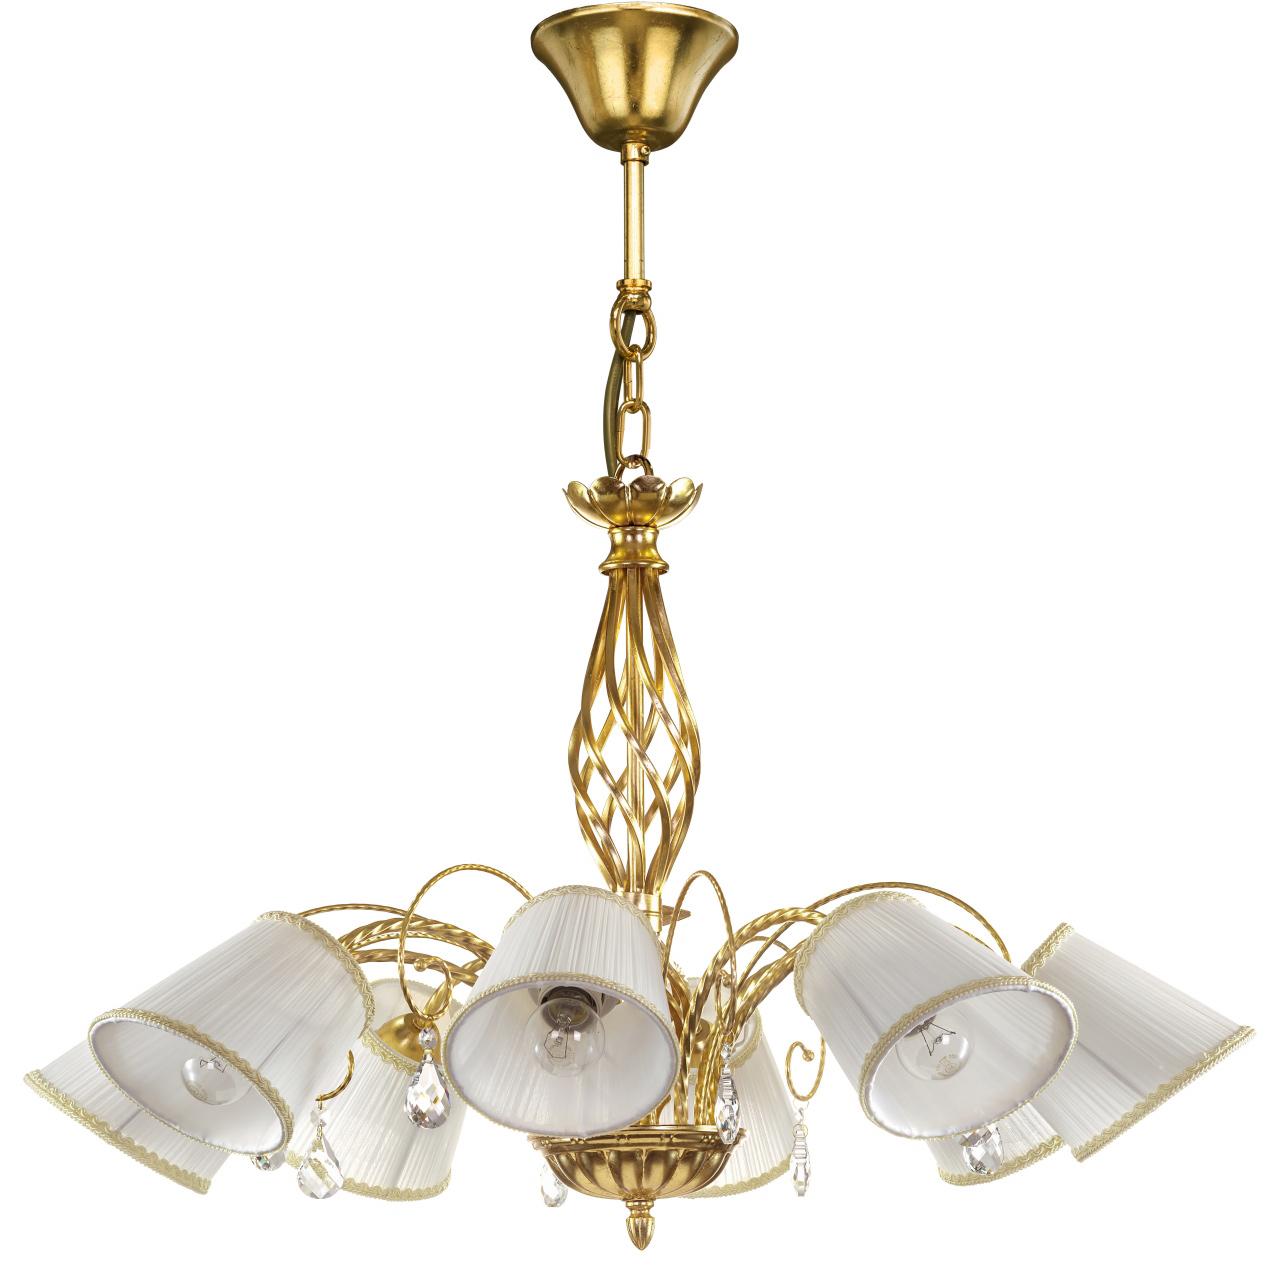 Люстра подвесная Esedra 8x40W E27 gold foil ткань Lightstar 796183